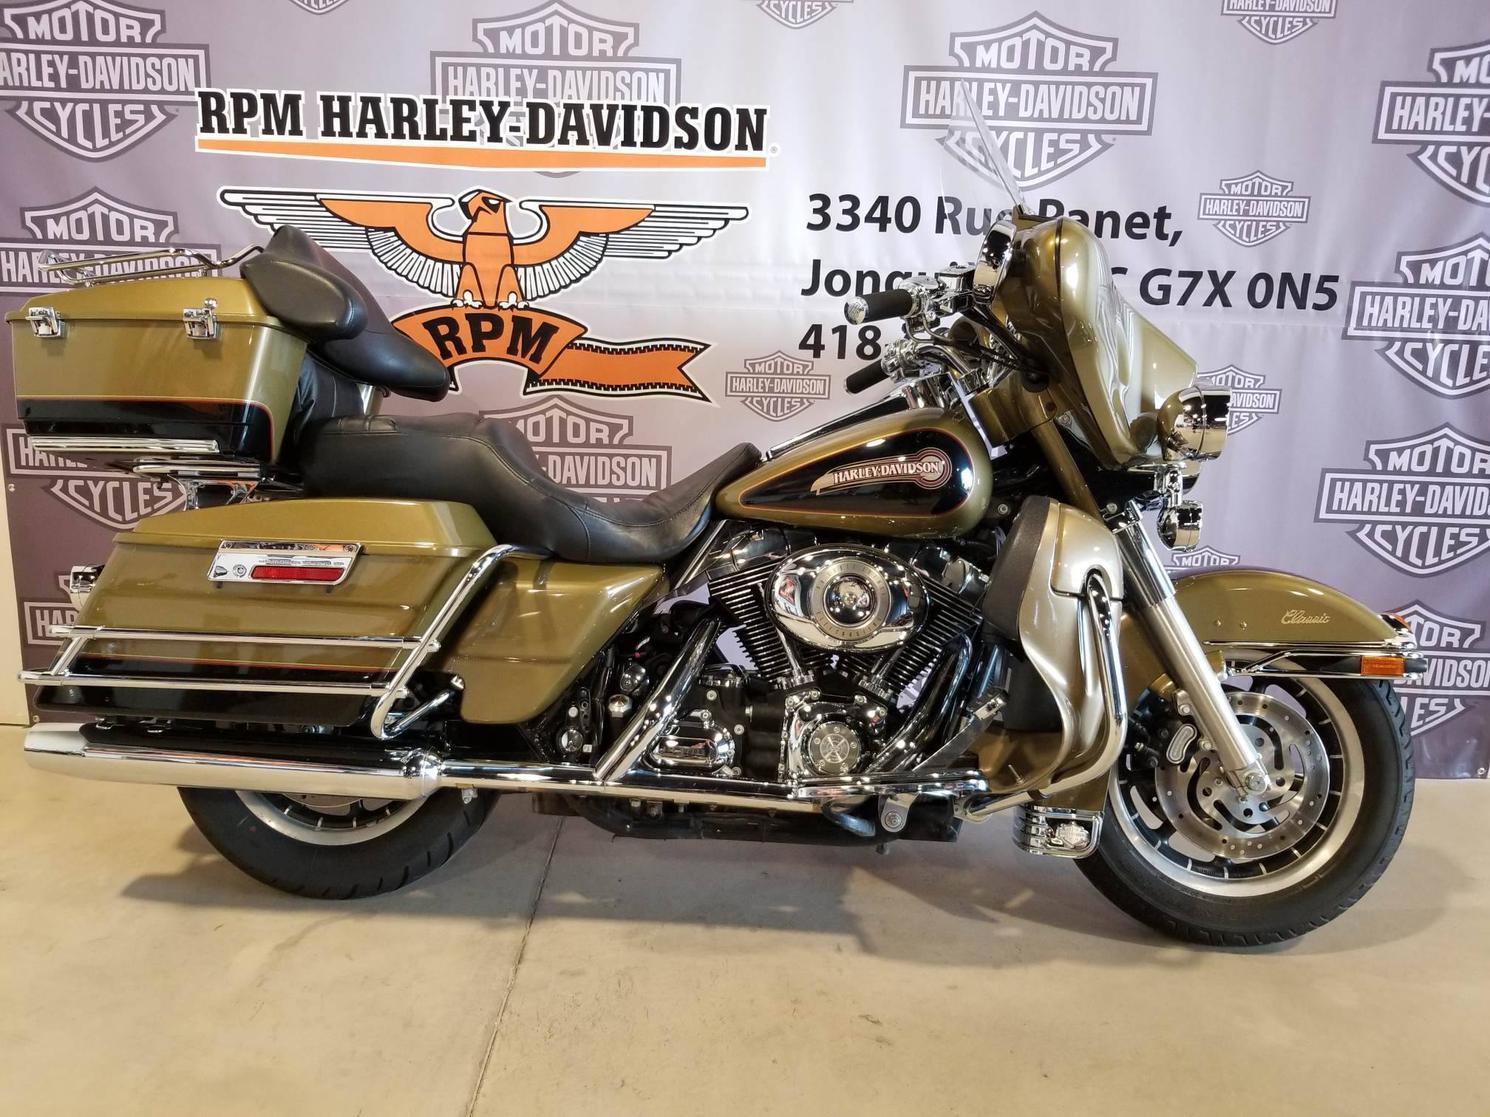 Y686667 Harley-Davidson Electra Glide 2007